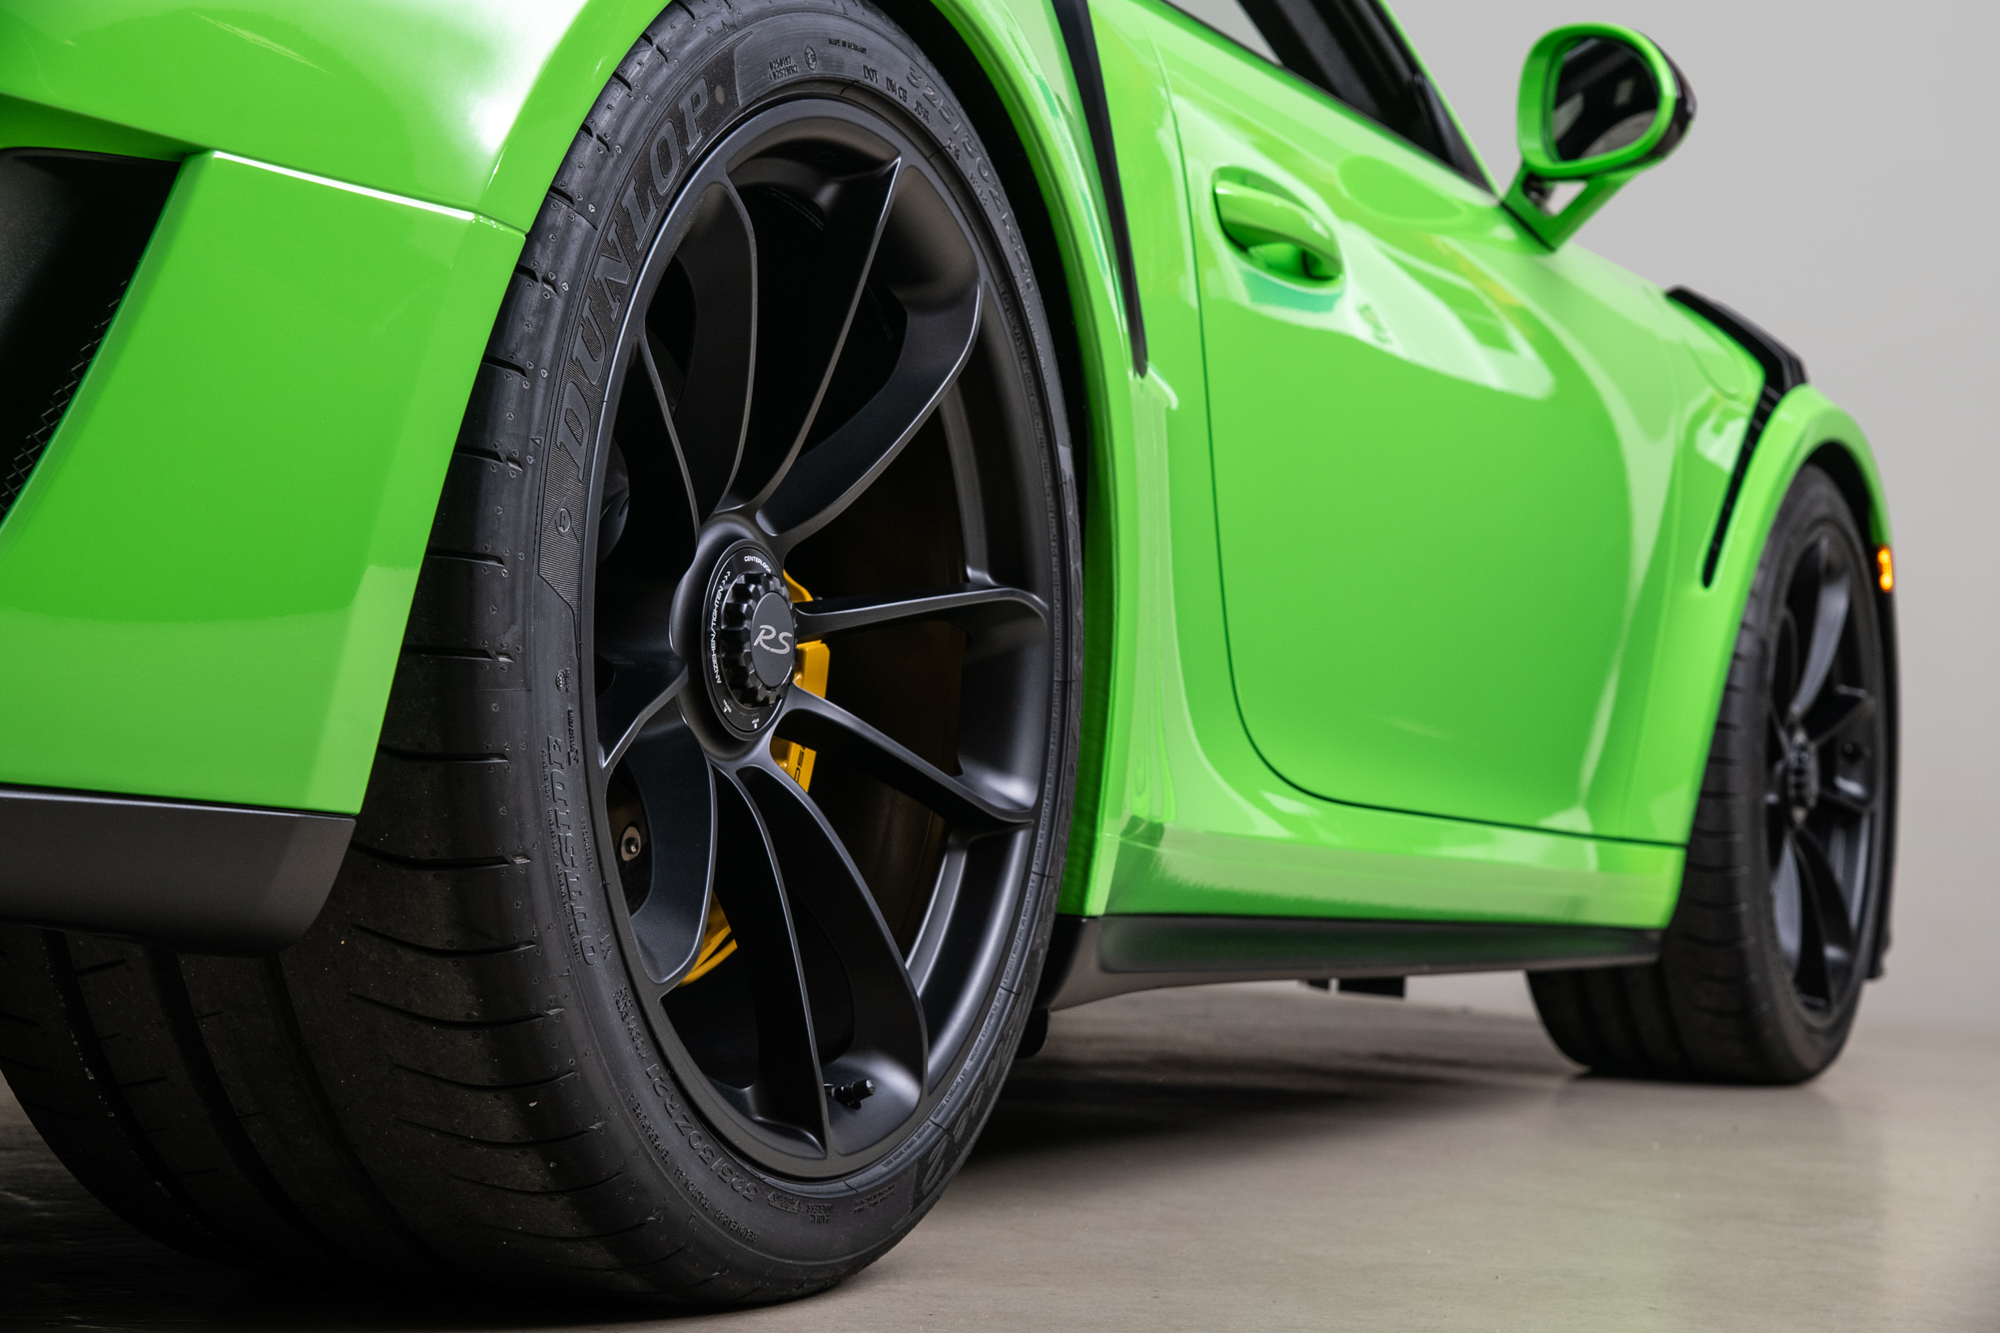 2019 Porsche 911 GT3 RS , LIZARD GREEN, VIN WP0AF2A94KS164564, MILEAGE 15